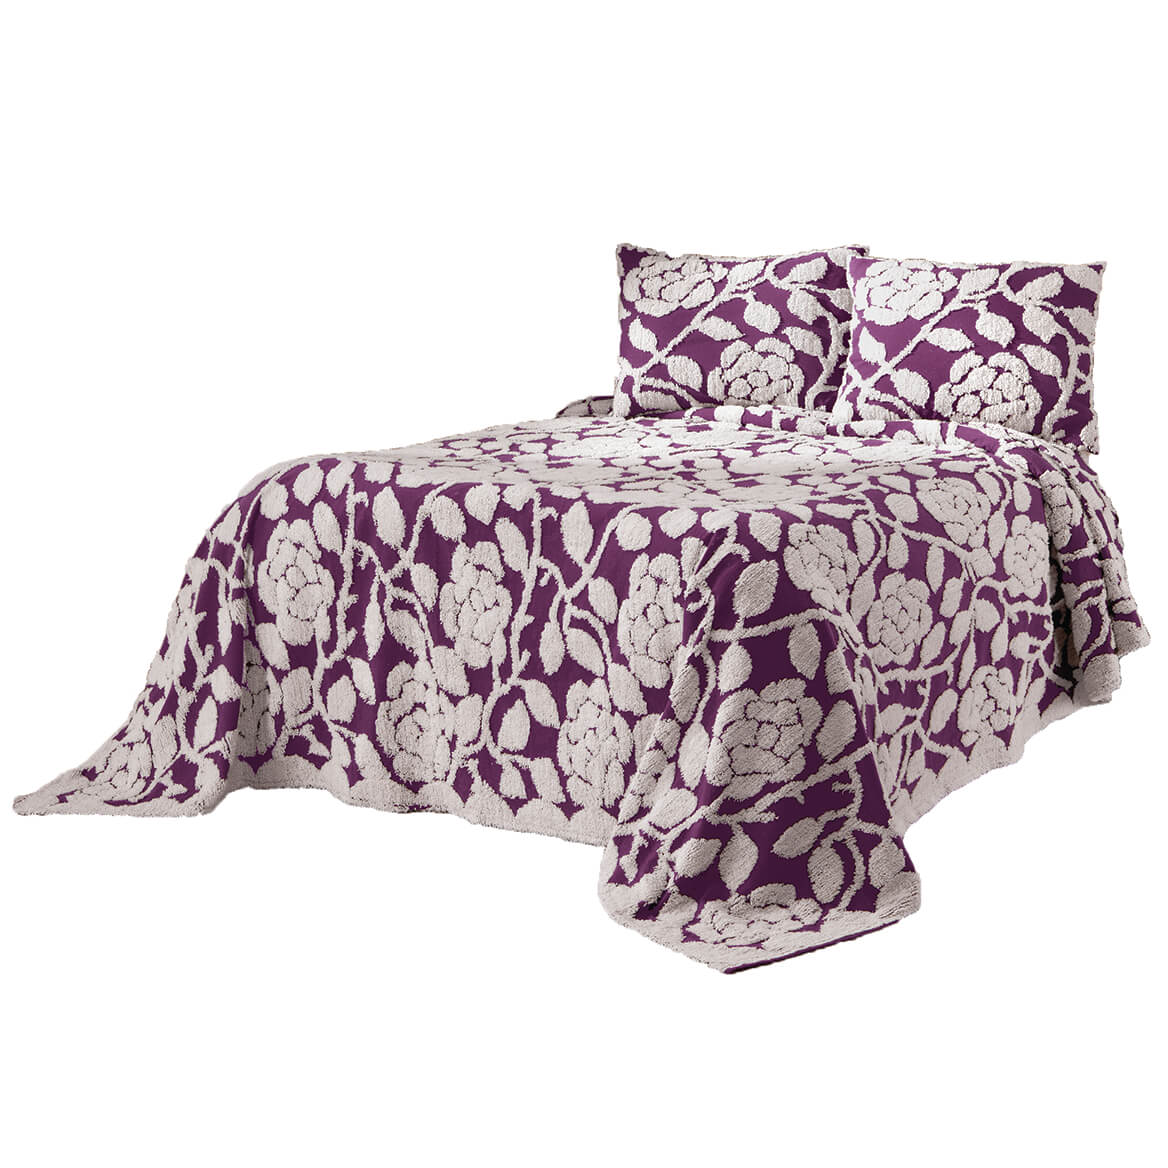 The-Grace-Chenille-Bedspread-by-OakRidgeTM thumbnail 32